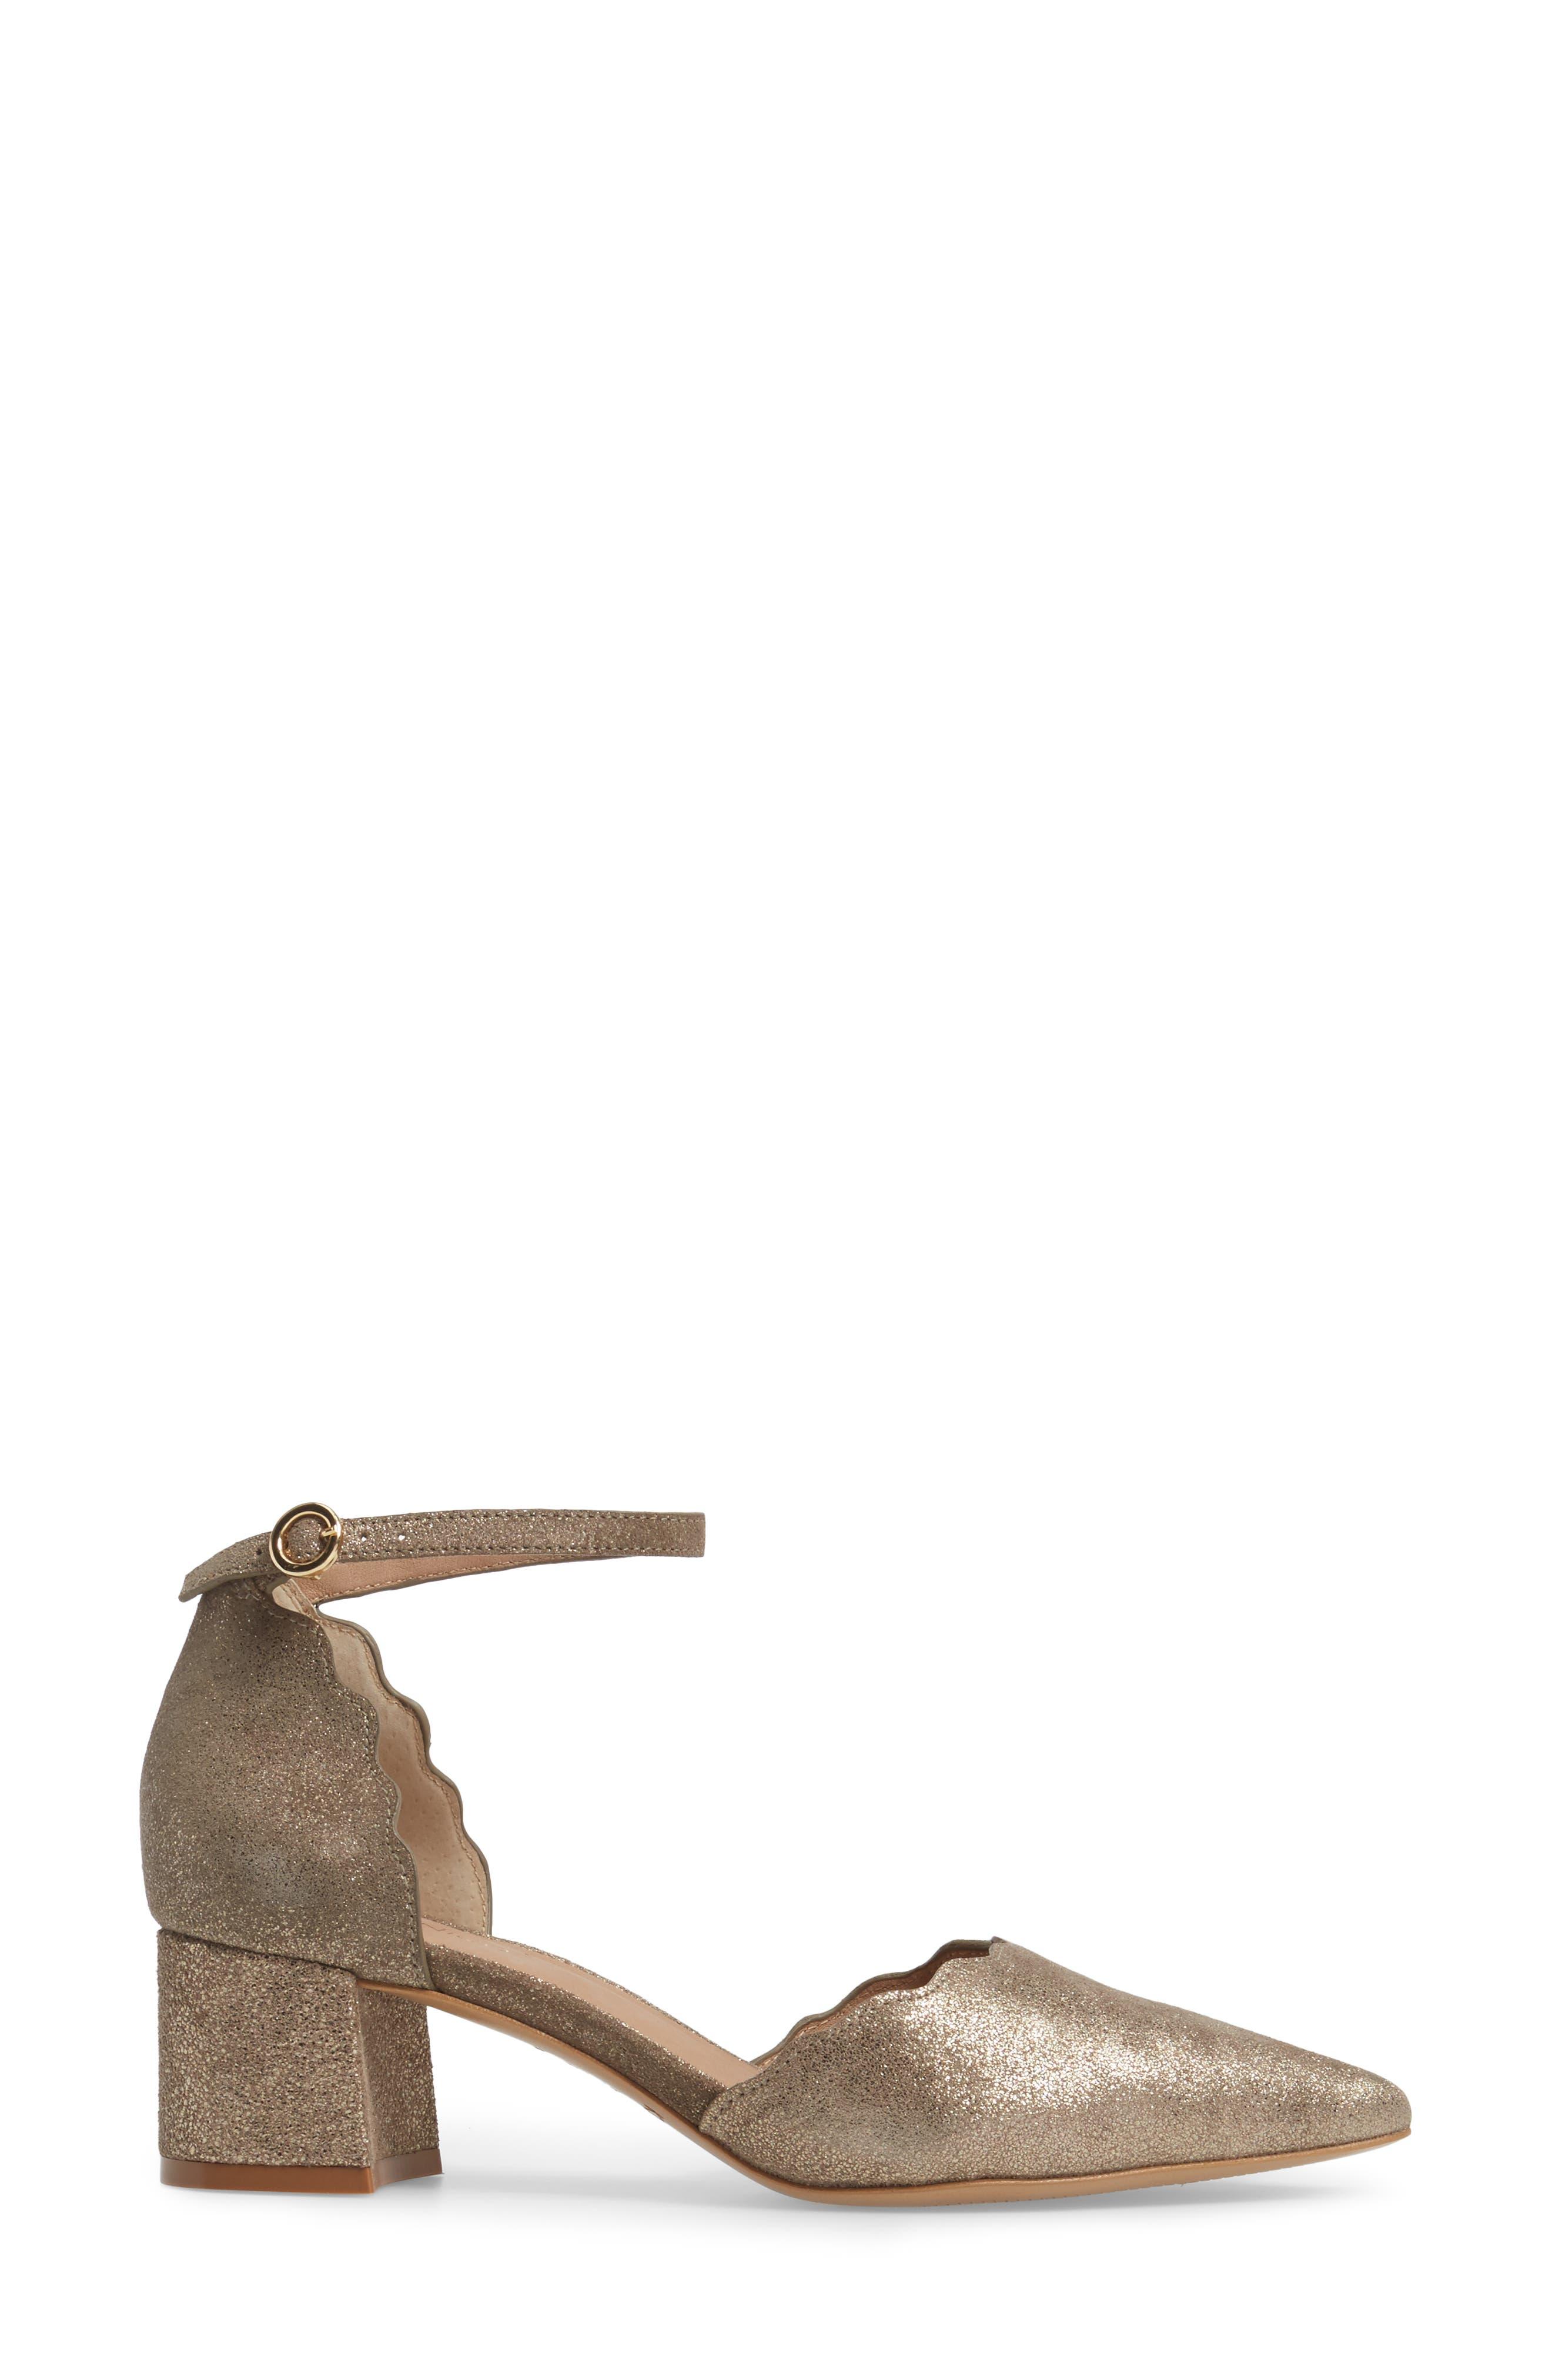 KLUB NICO,                             Roseia Pump,                             Alternate thumbnail 3, color,                             PEWTER SUEDE